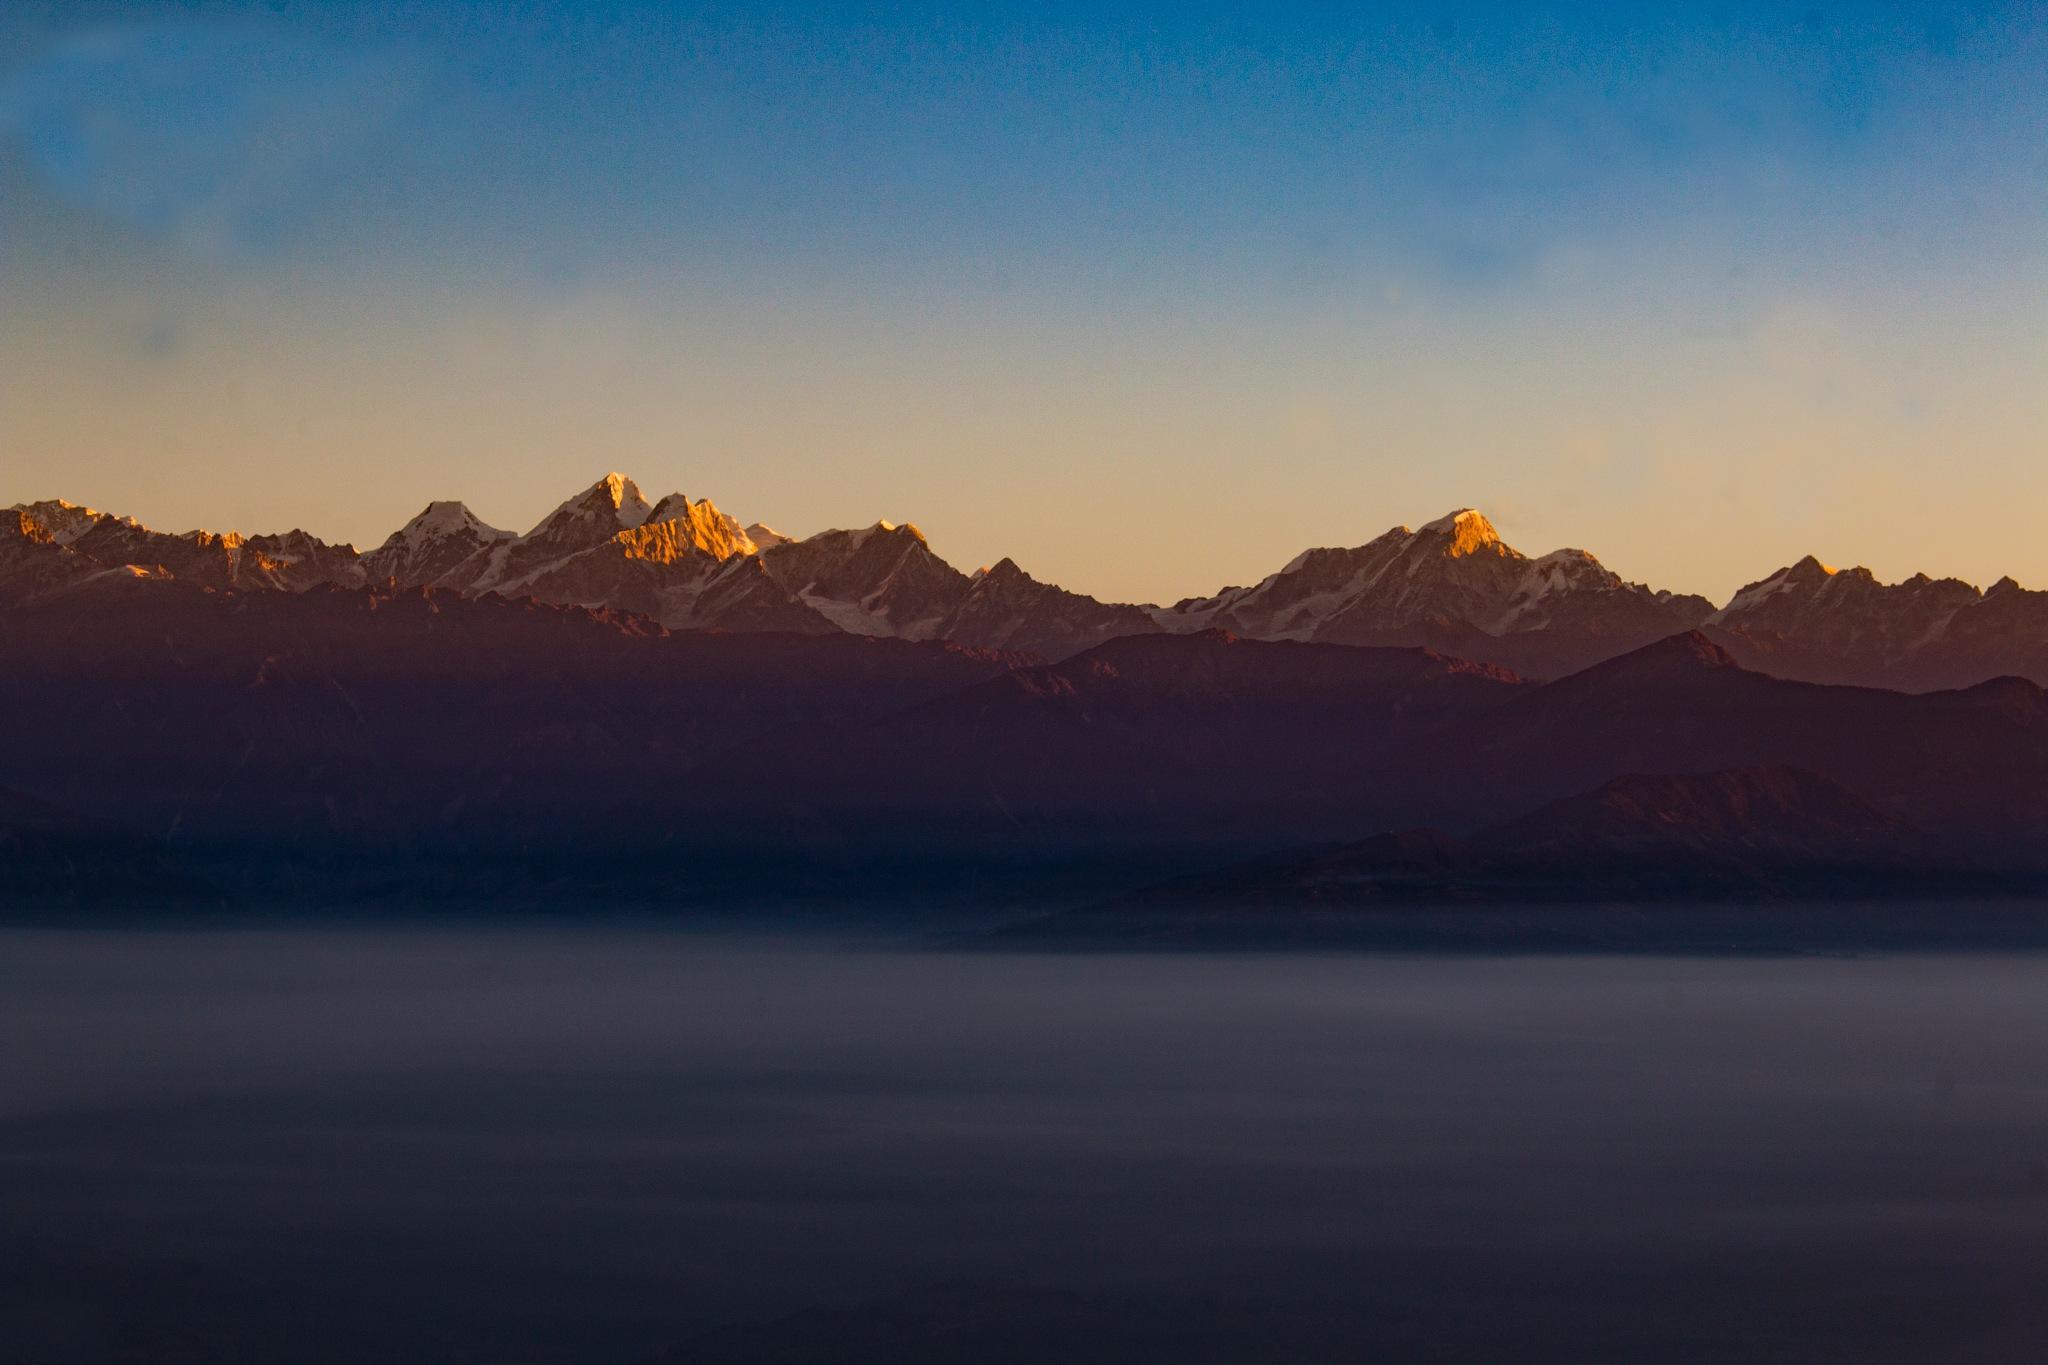 The Golden Light  by Deepak Prajapat